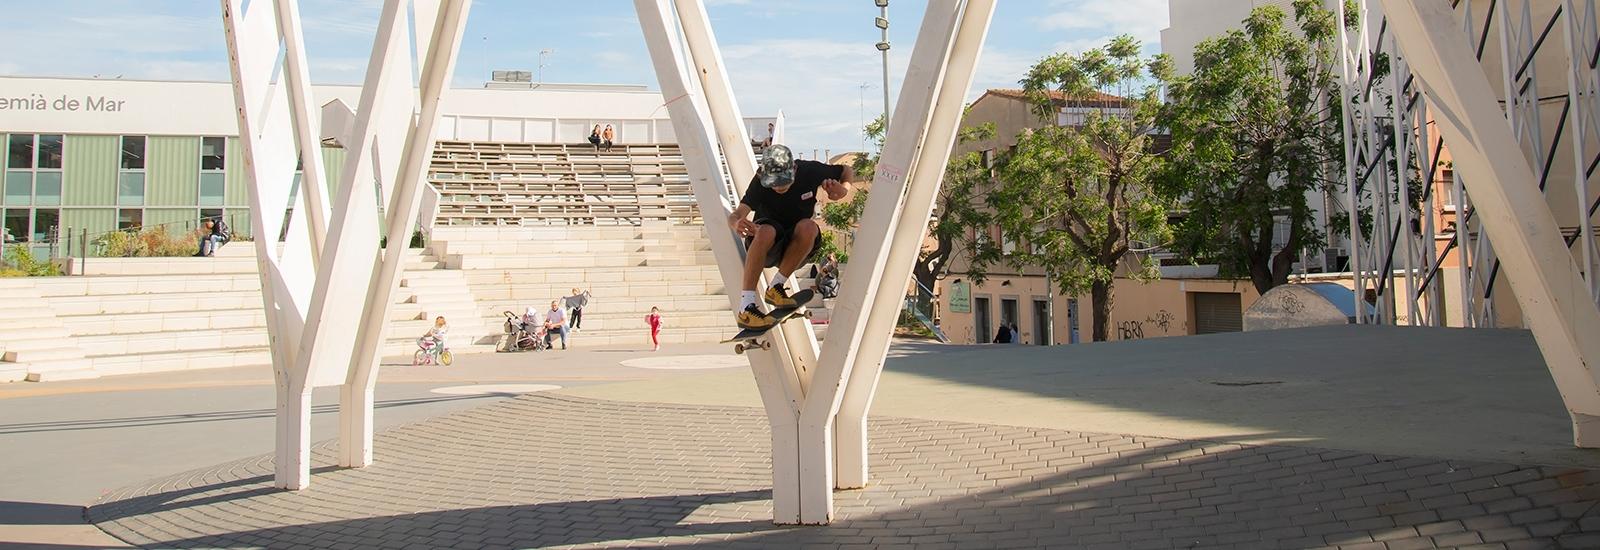 Skateboard - Hydroponic